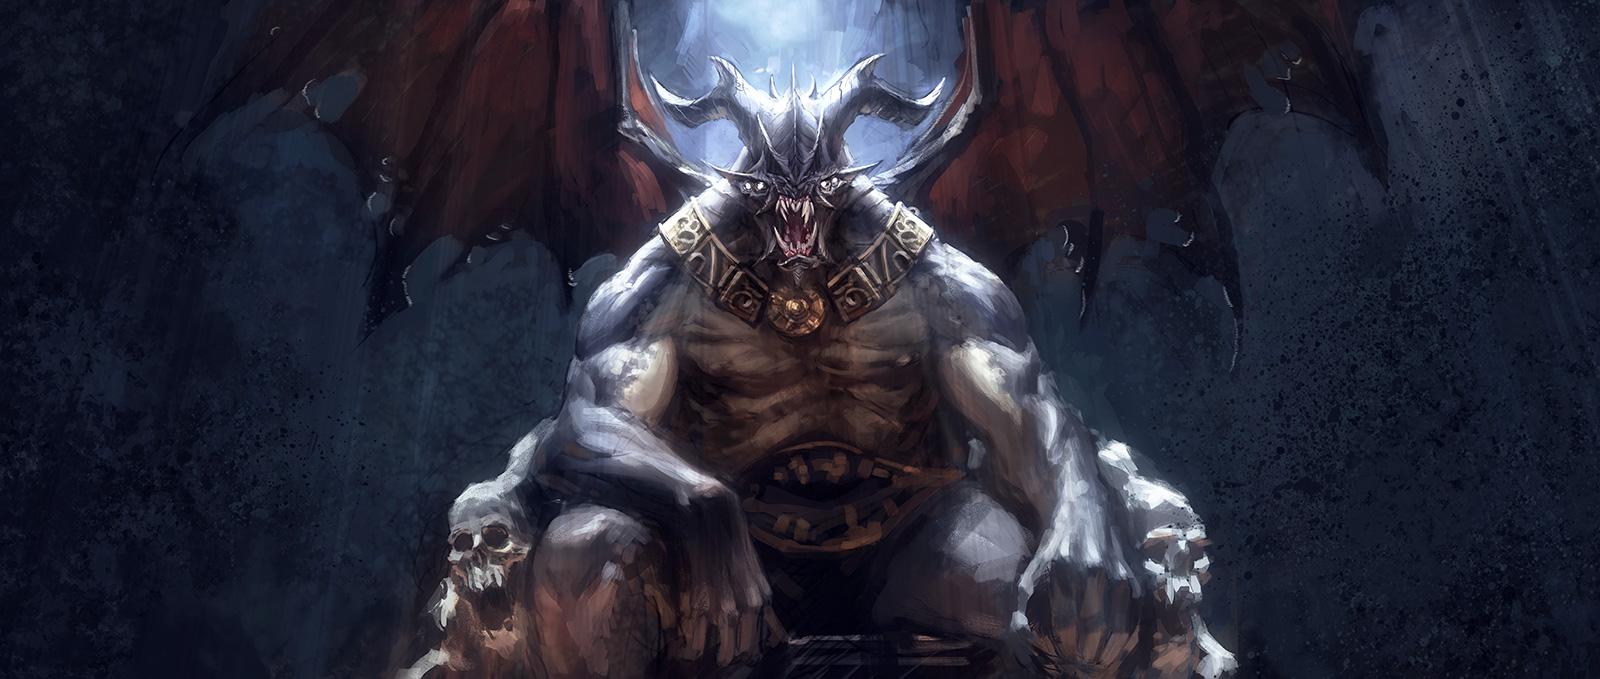 Biowares Online Action Game Delayed For Origin